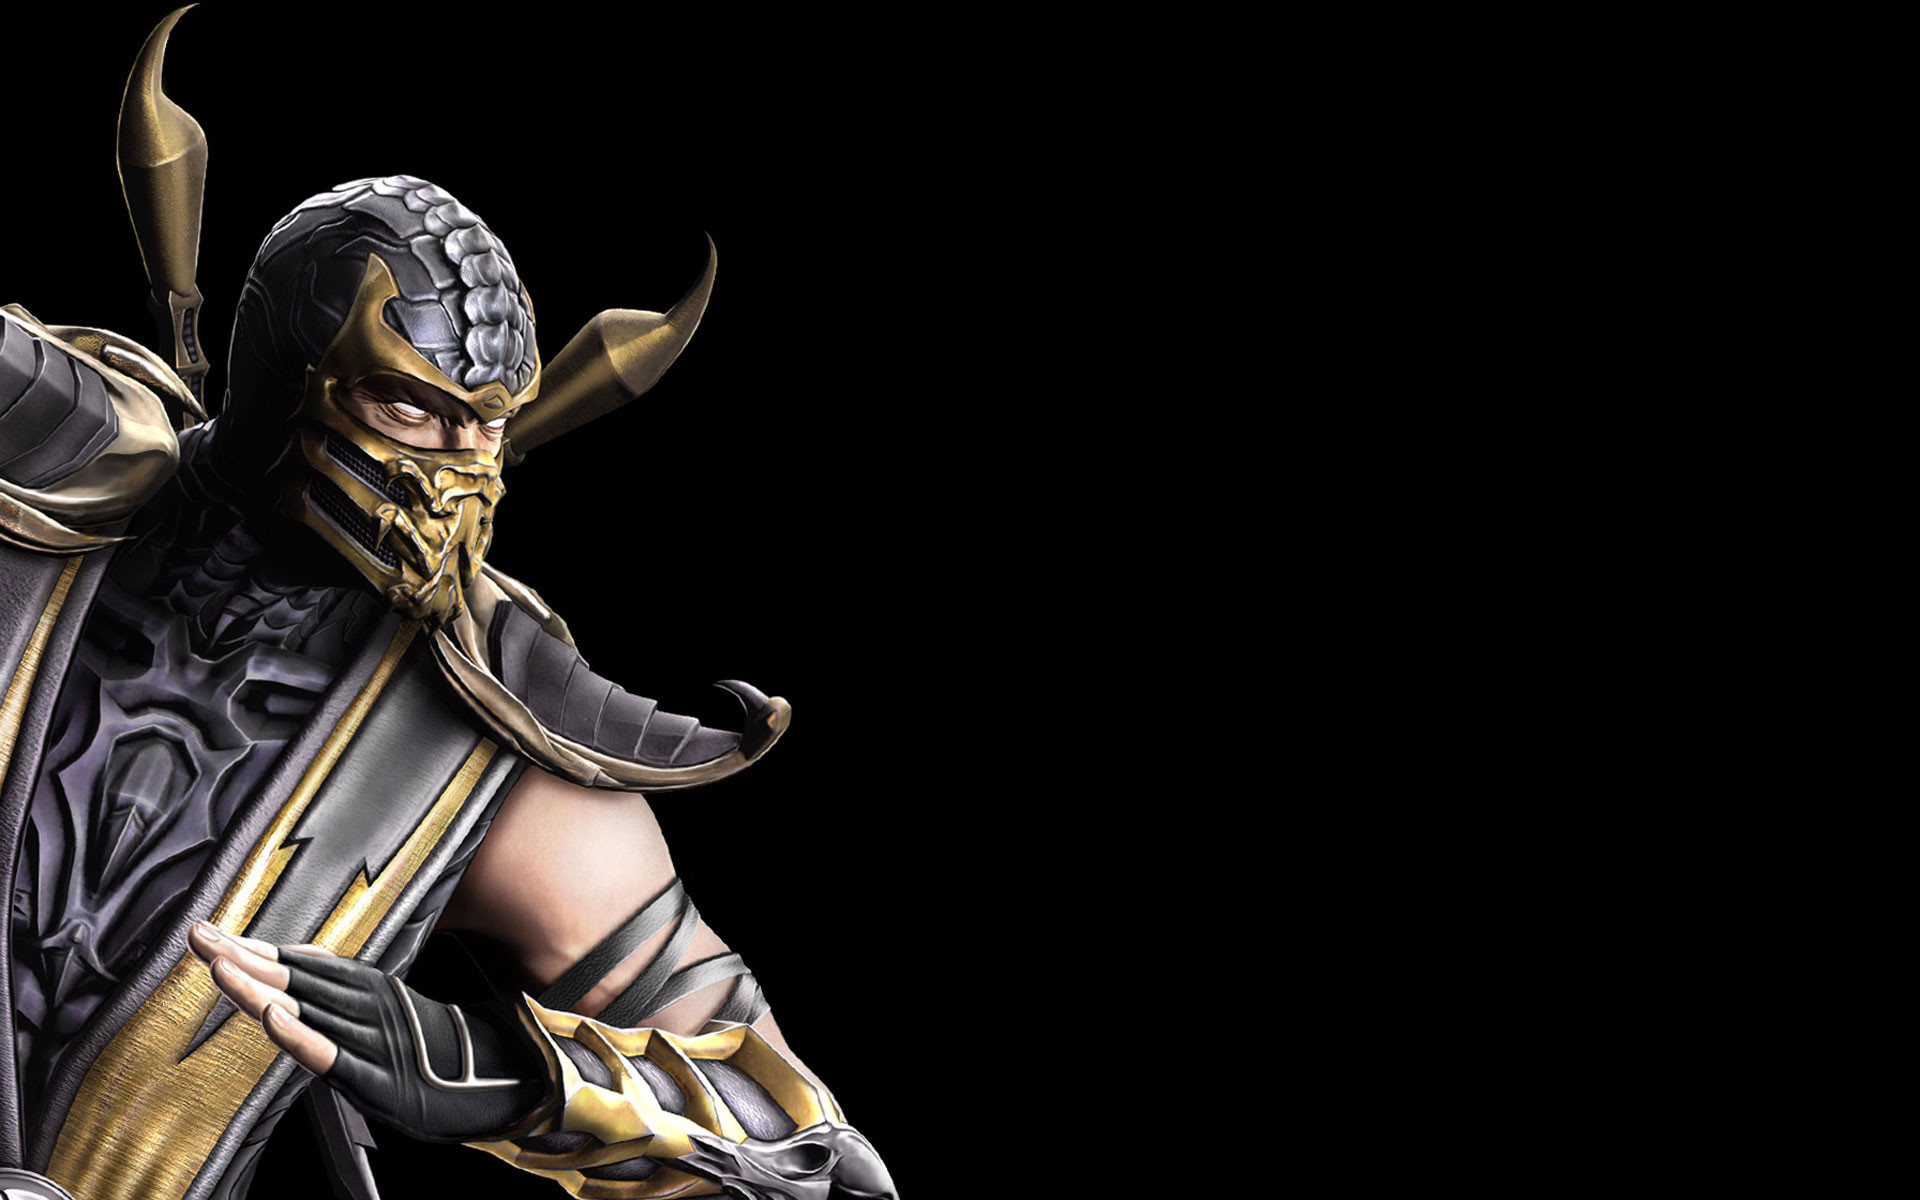 Mortal Kombat 9 Scorpion Wallpaper 1